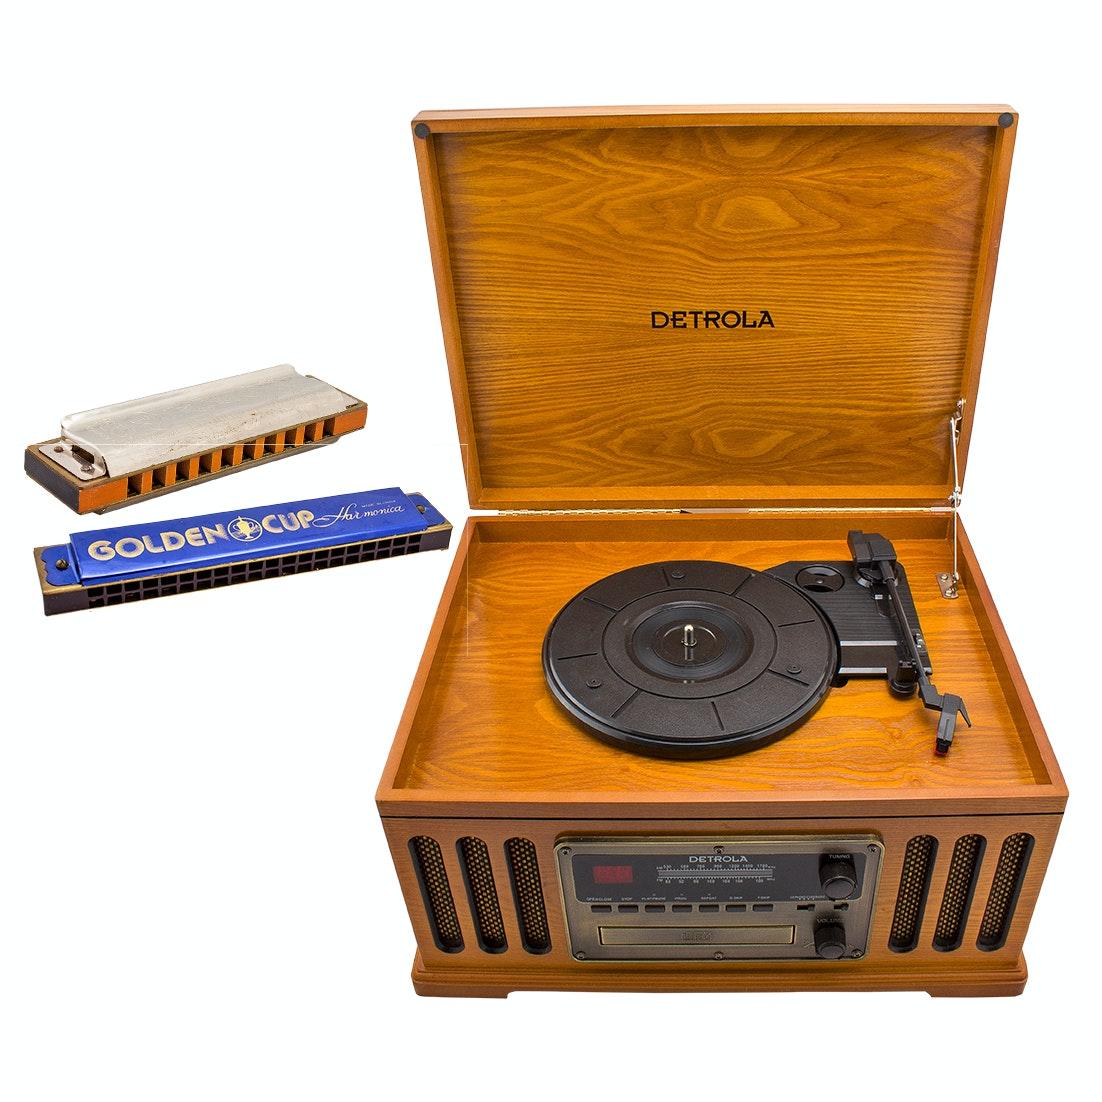 Detrola Turntable CD Player AM/FM Radio and Vintage Harmonicas